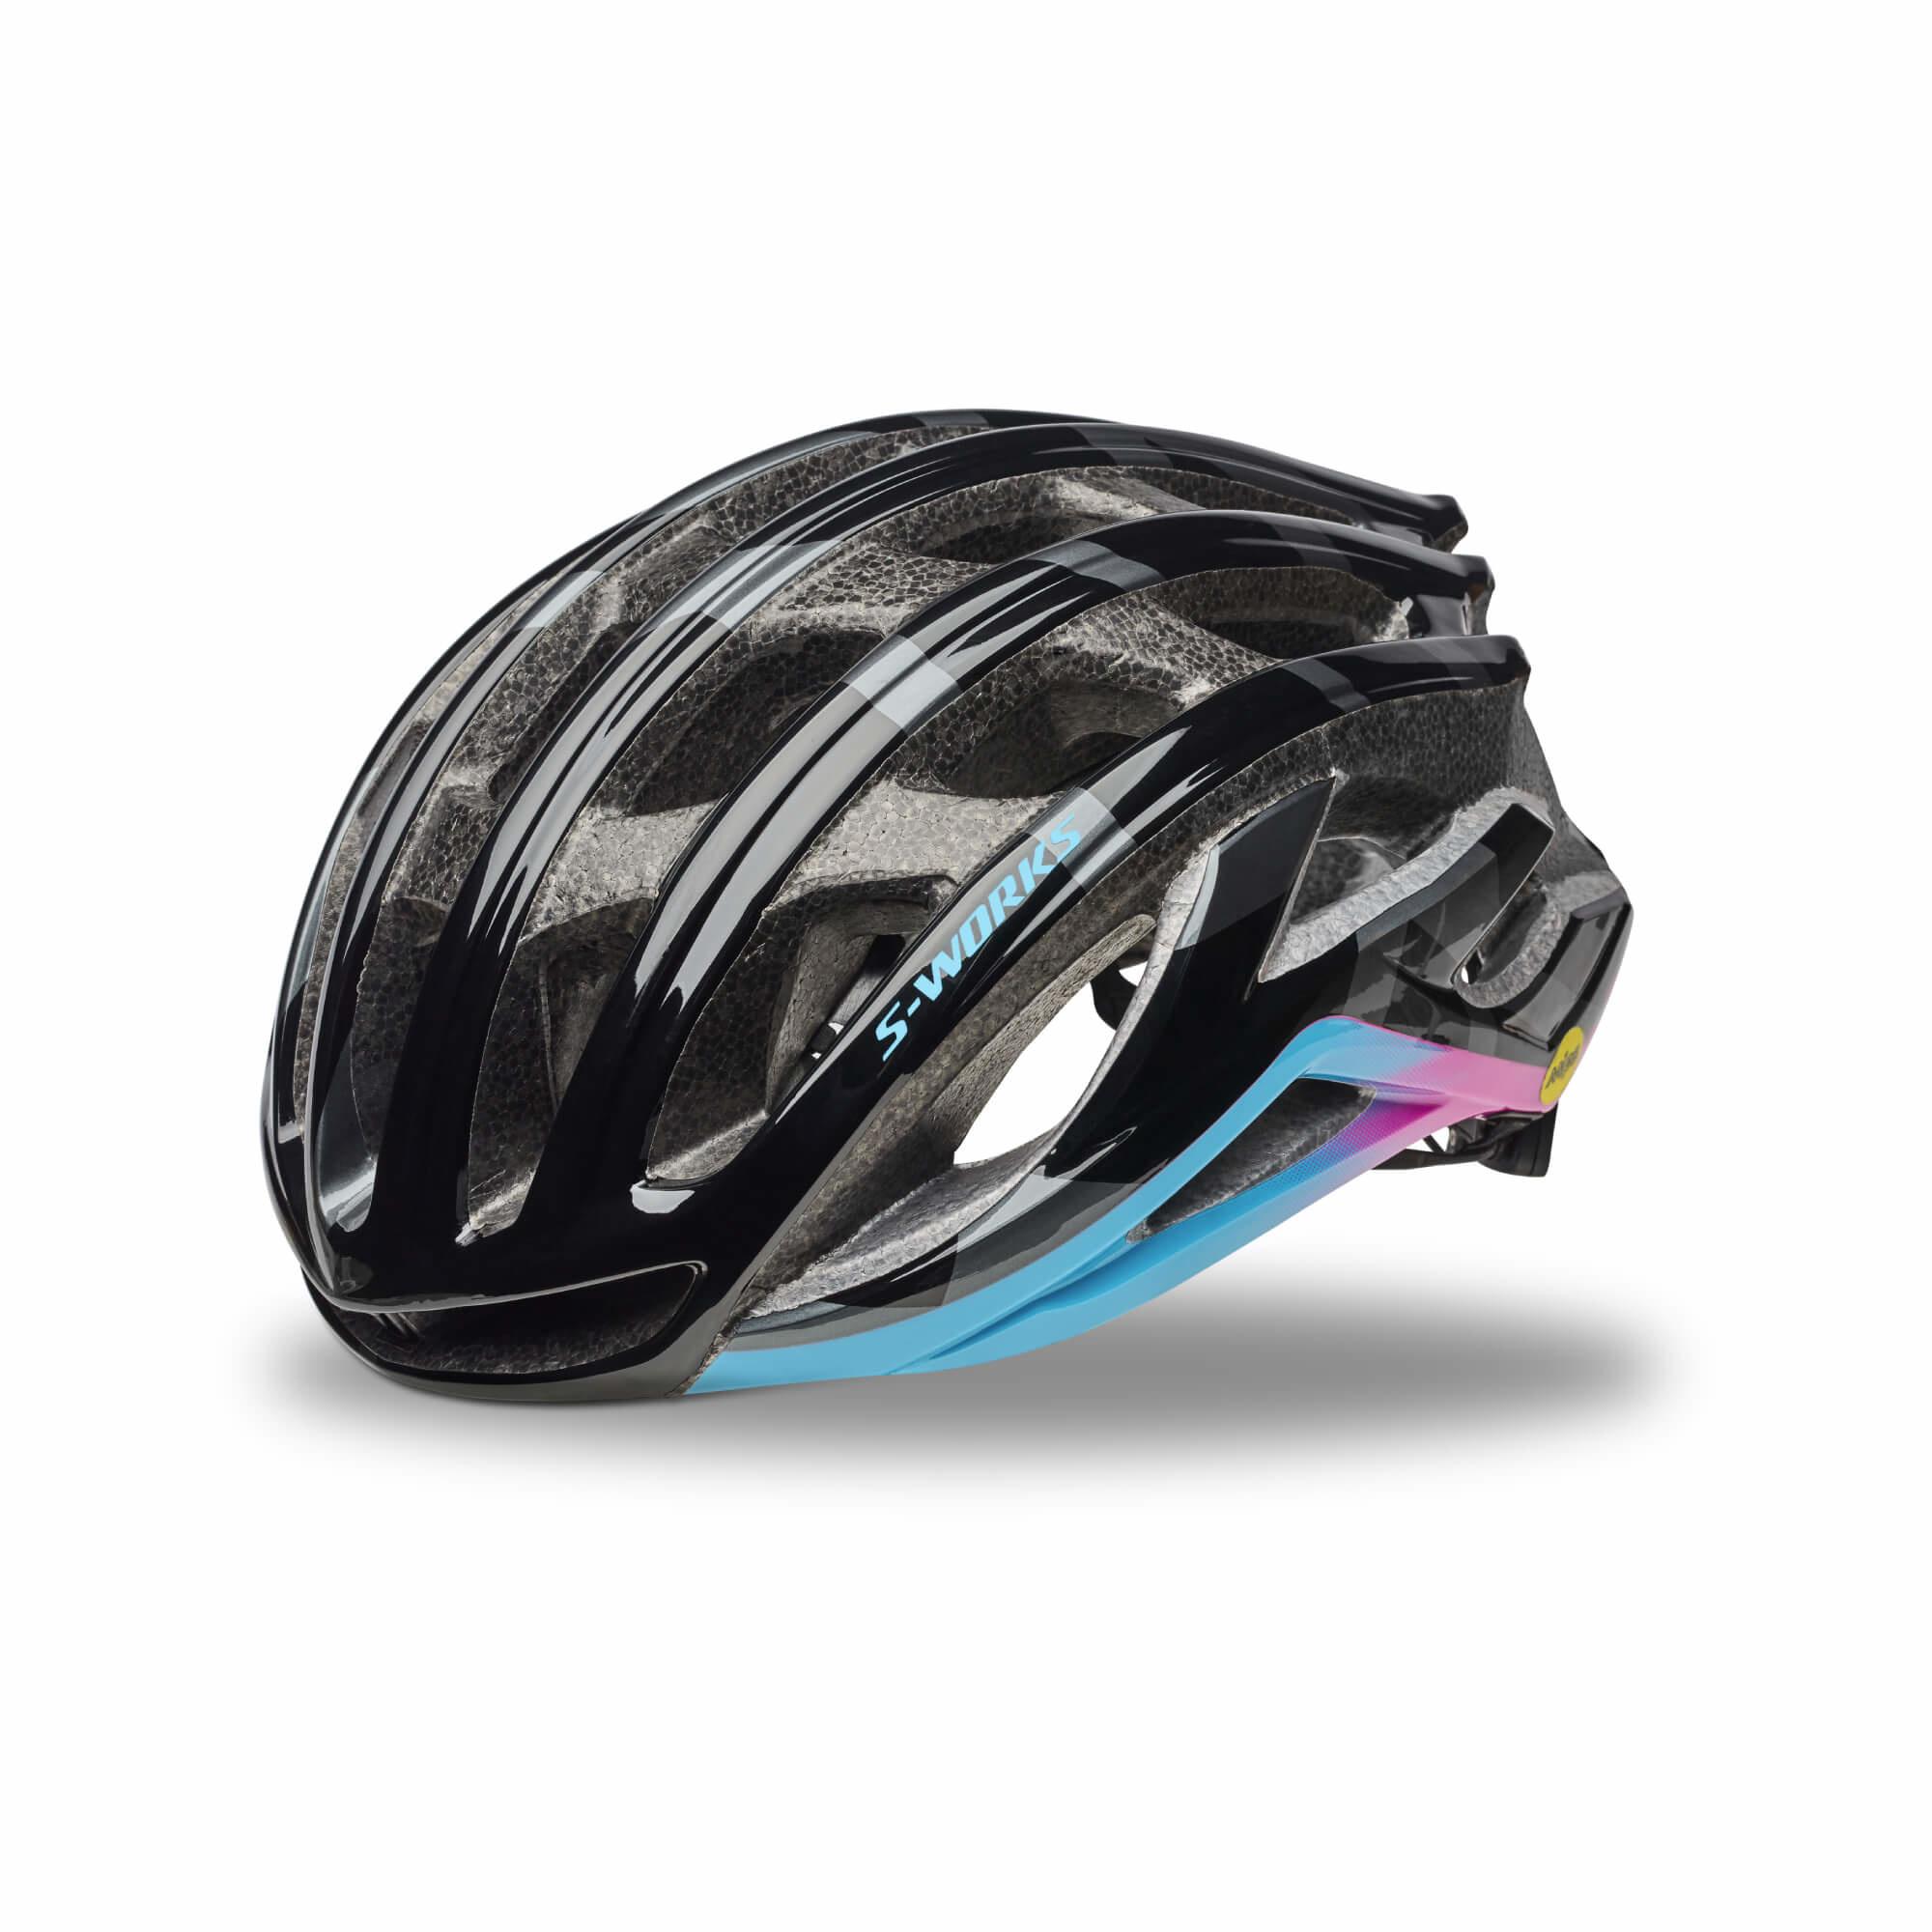 S-Works Prevail II Helmet Angi Mips 2019-2020-2